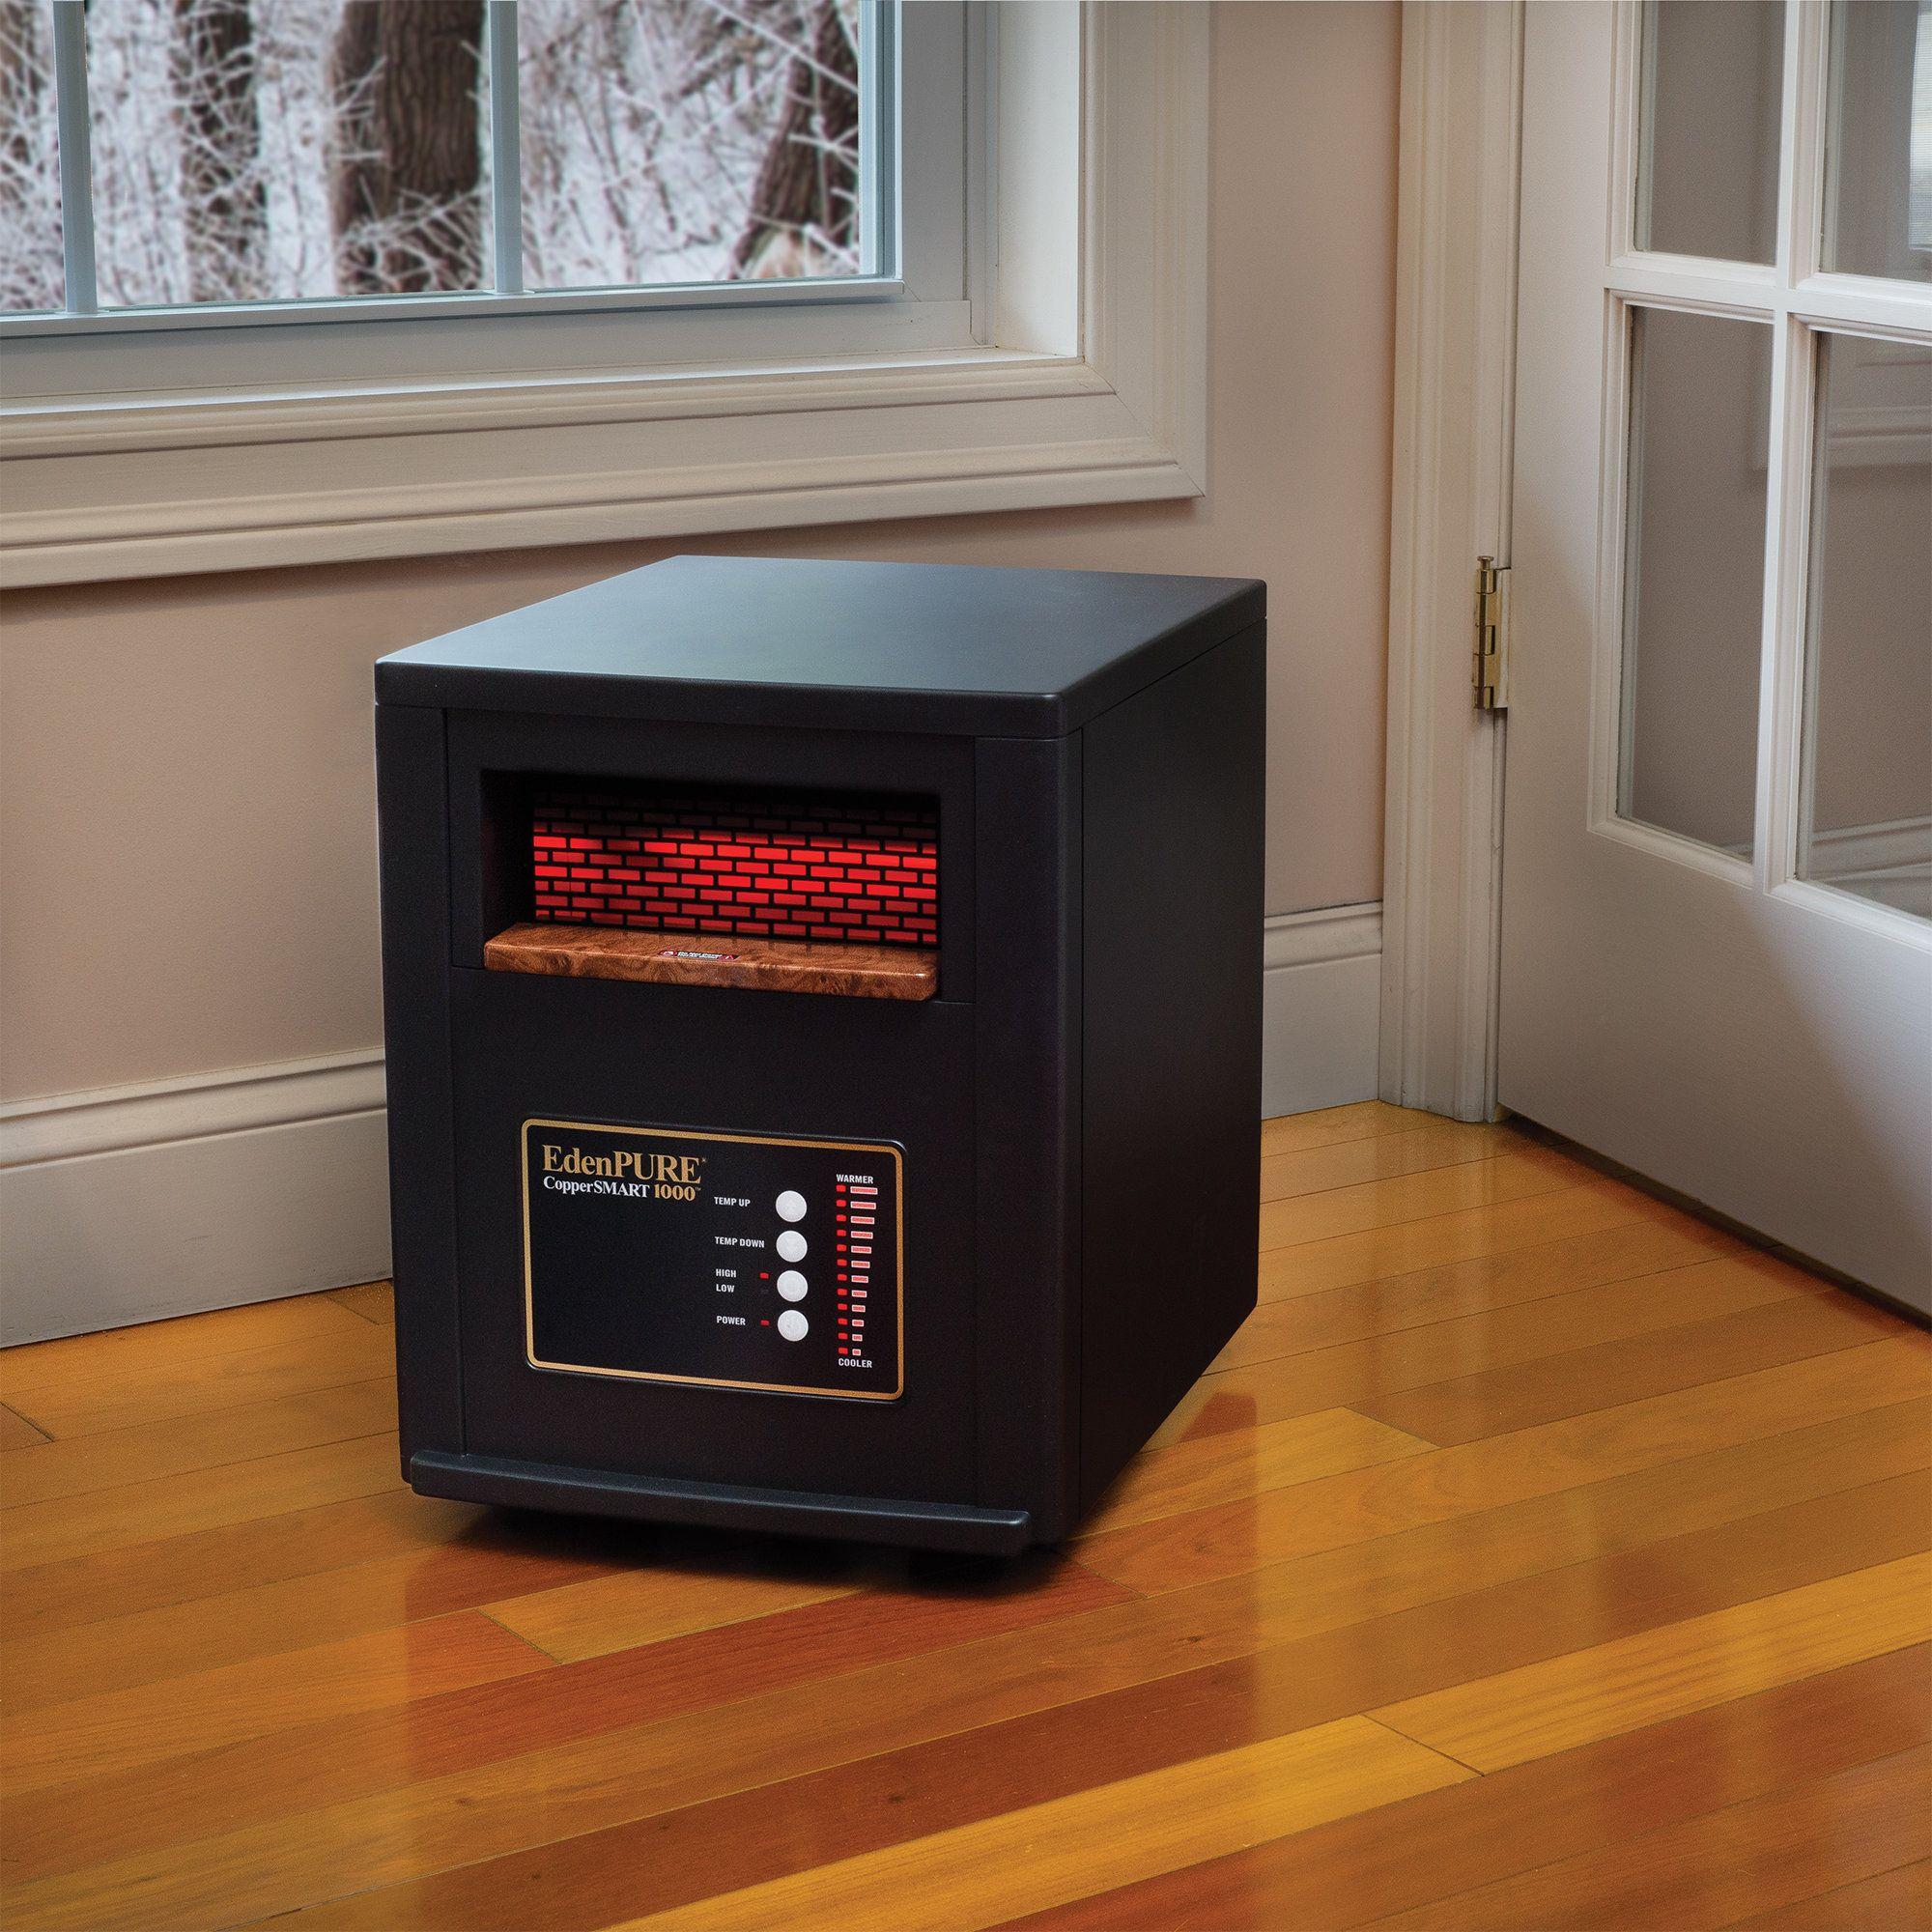 Bil Burkett Edenpure Heater Energy Saver Energy Saver Grand